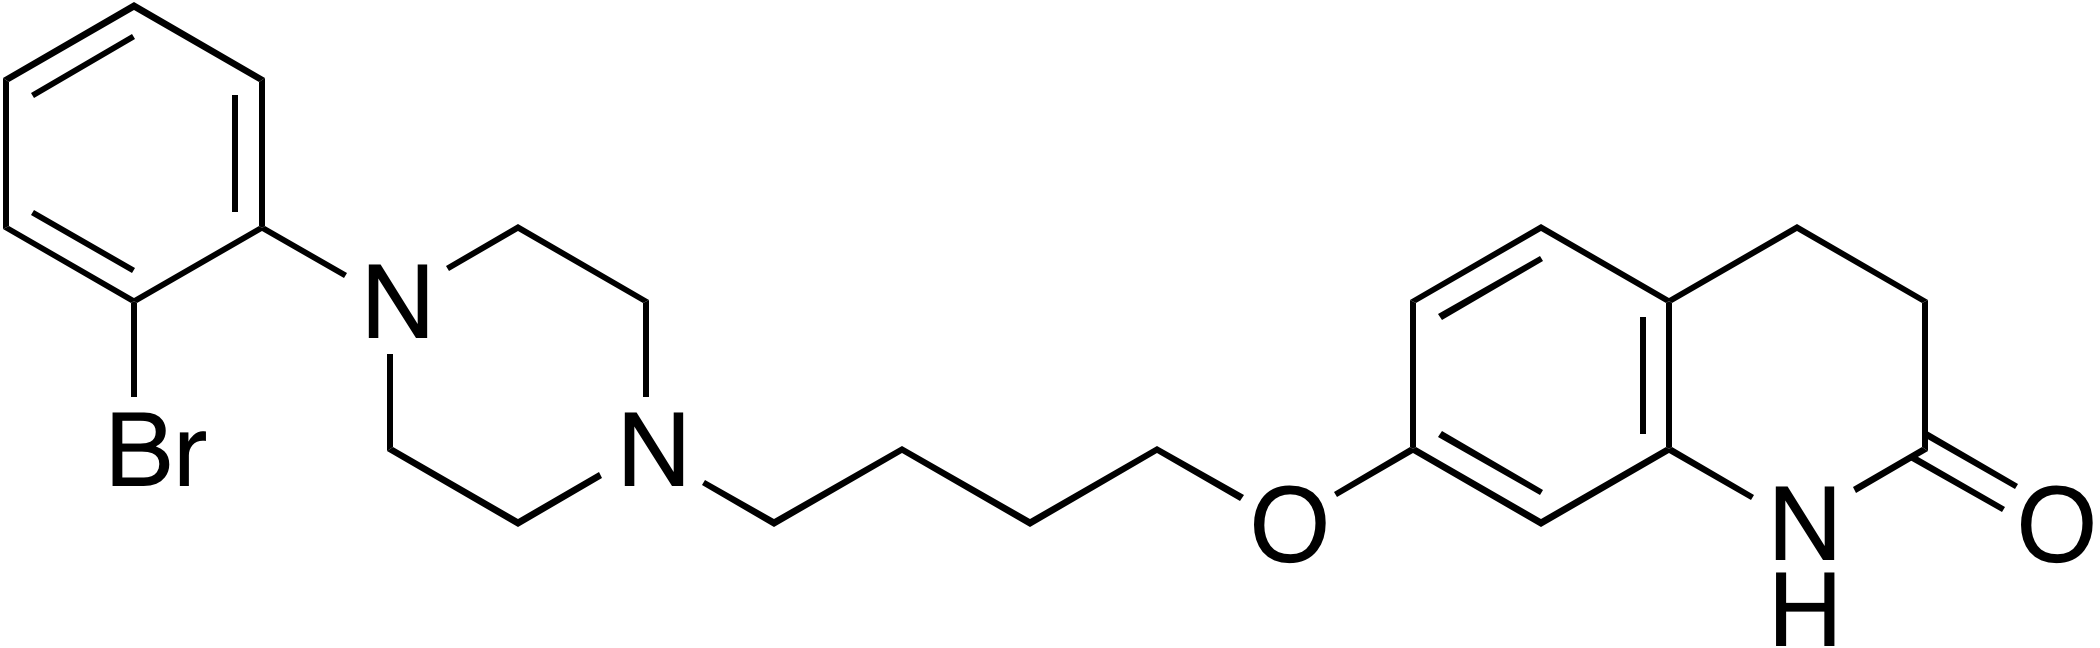 Aripiprazole impurity (OPC 14714)